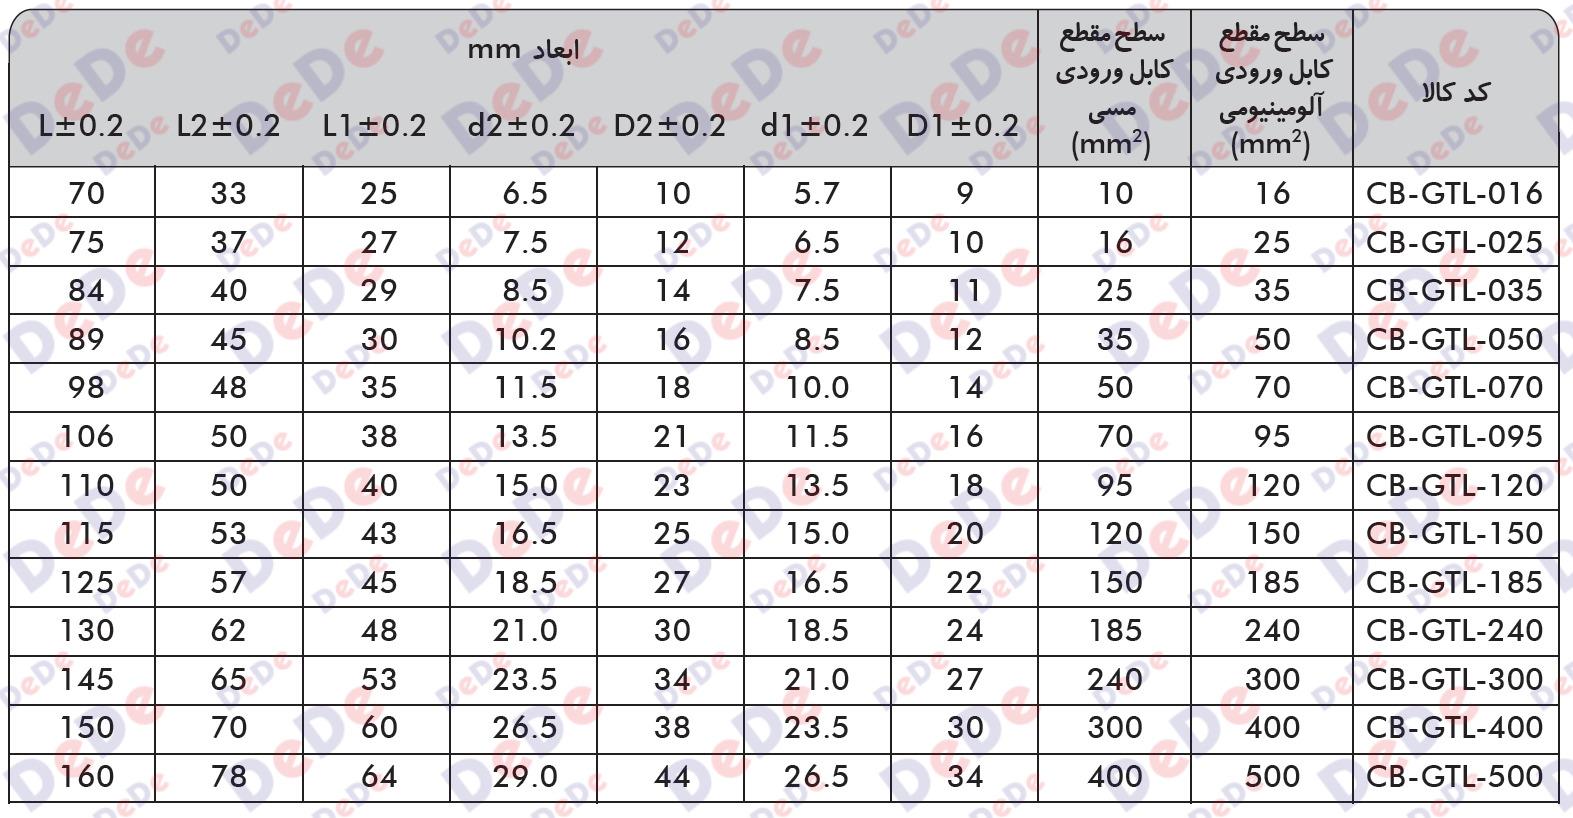 جدول مشخصات رابط بیمتال